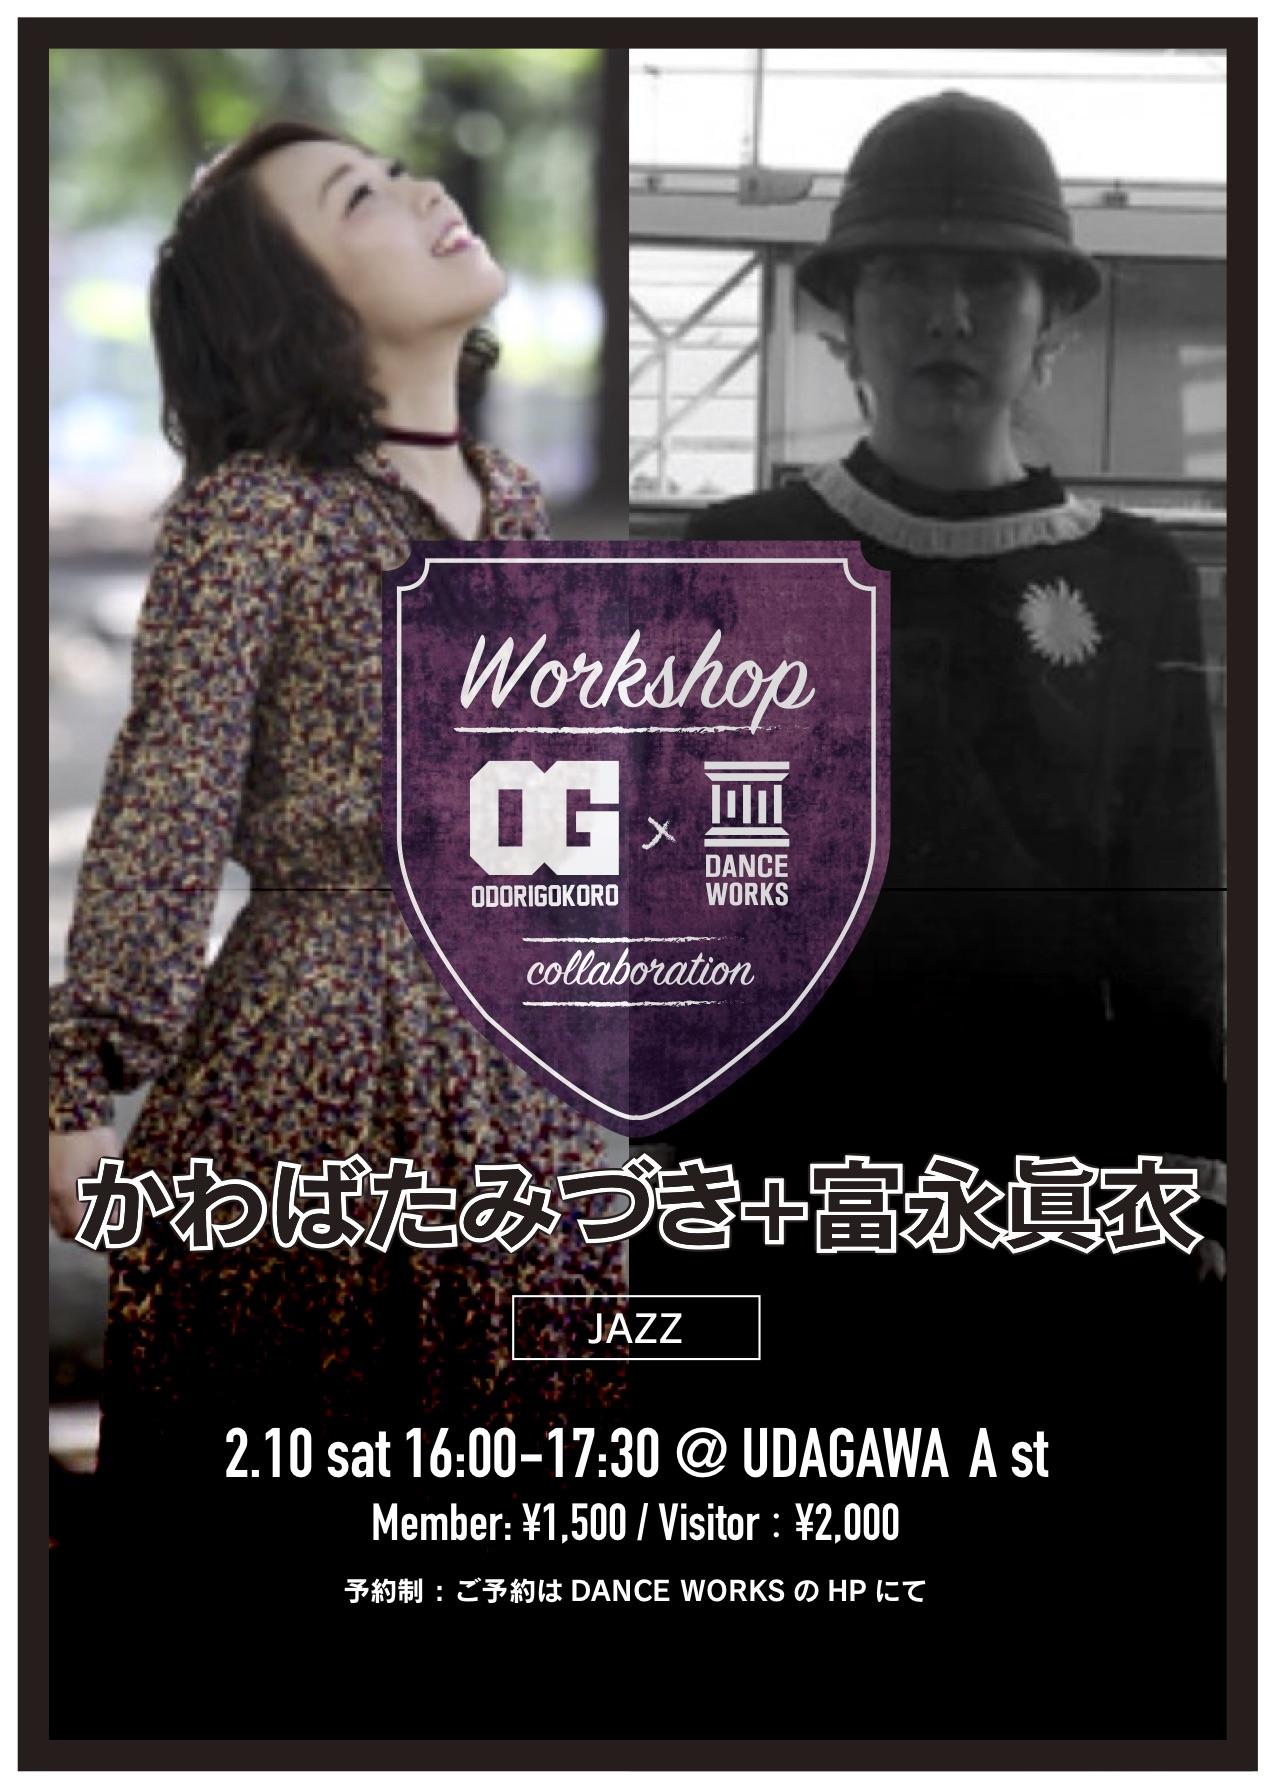 ogws_かわばた富永_印刷